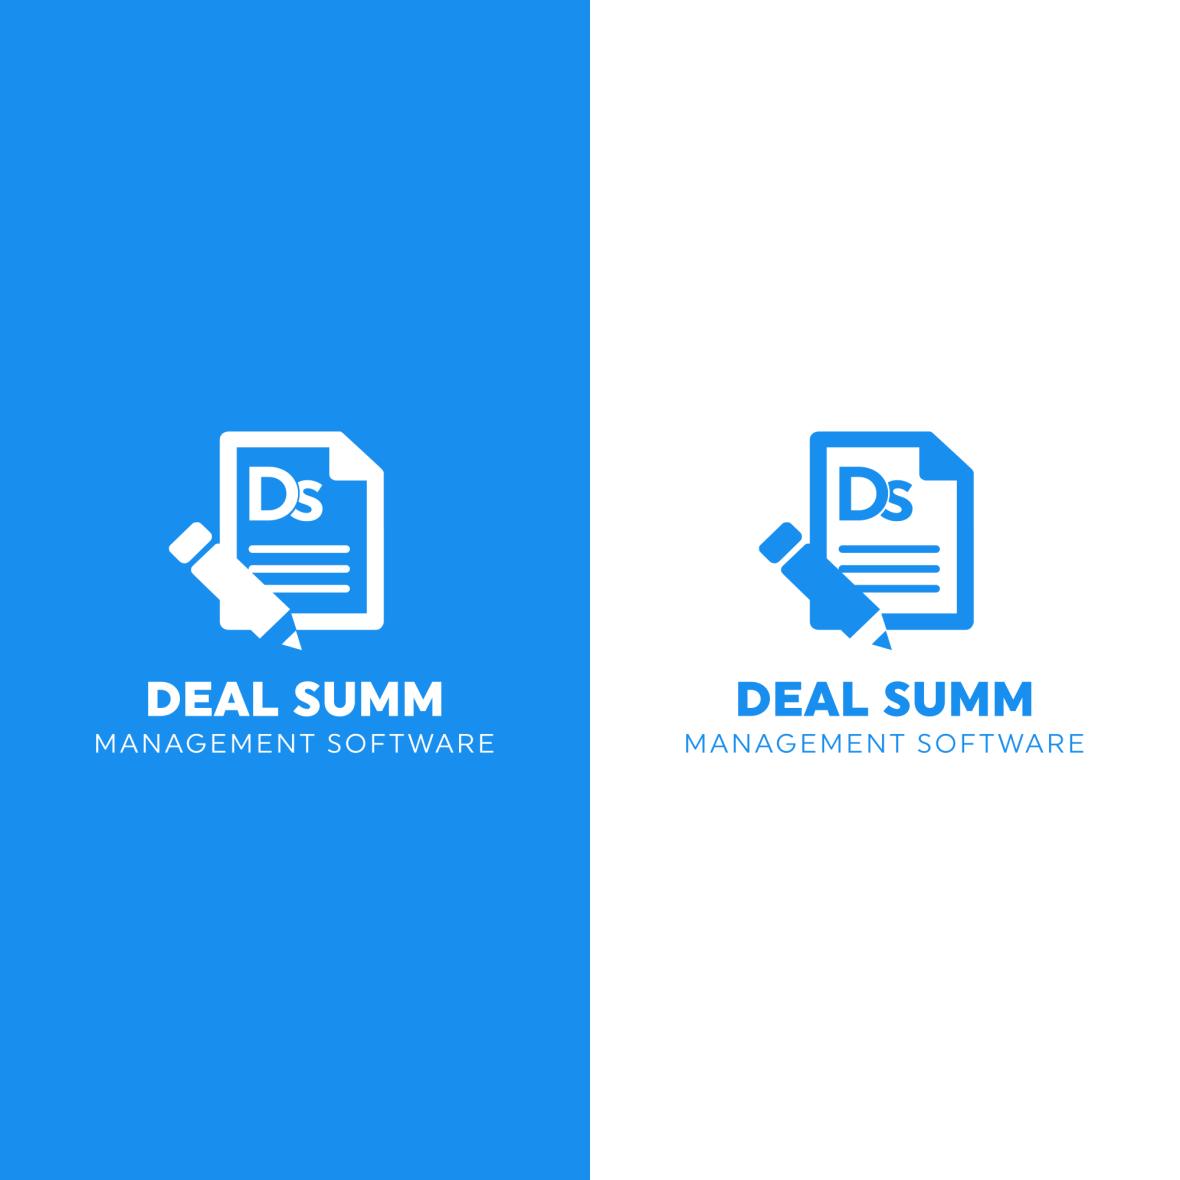 Deal-Summ